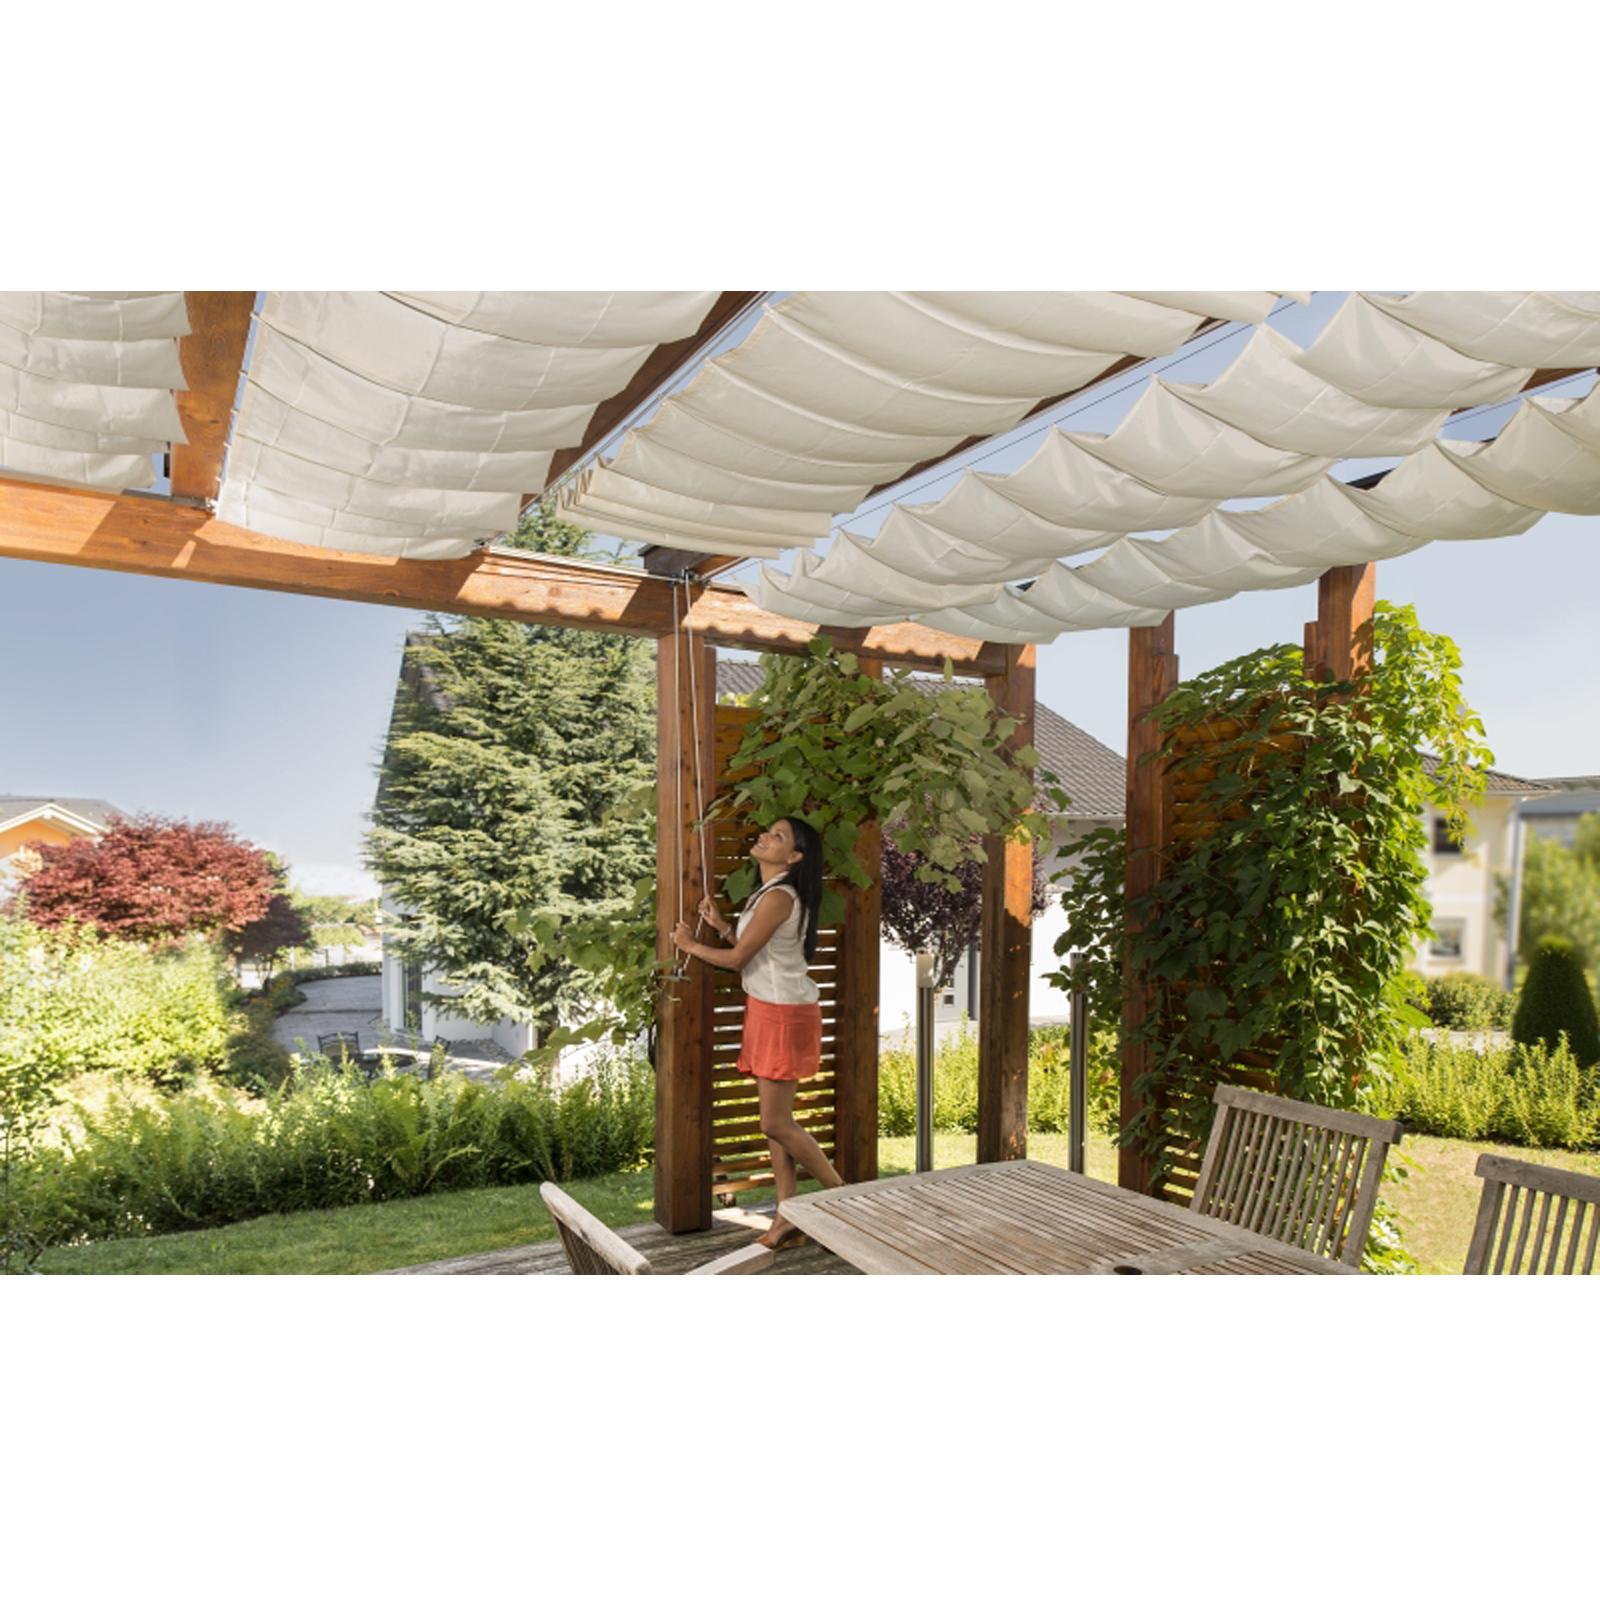 sonnensegel seilspannmarkise set wintergarten pergola beschattung sm270 windhager 3771. Black Bedroom Furniture Sets. Home Design Ideas